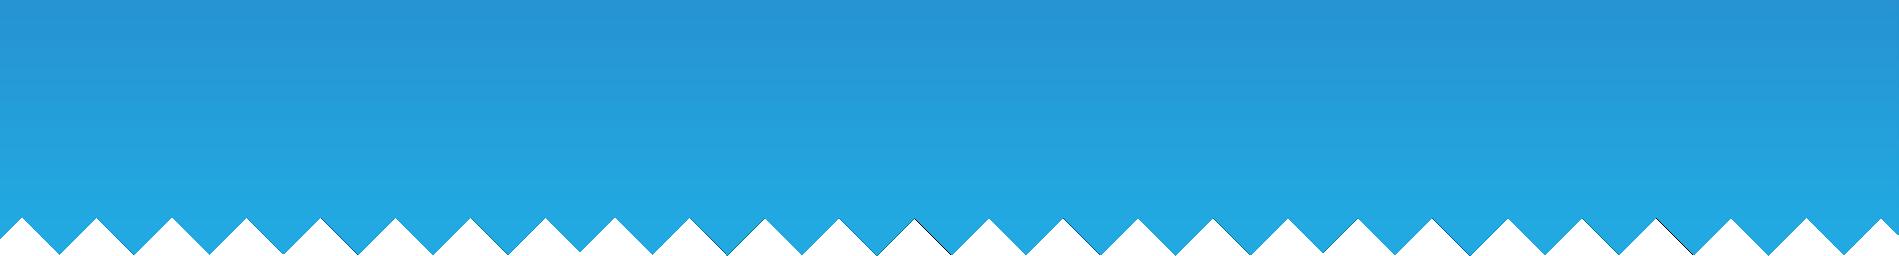 bg azul gradiente corte.png